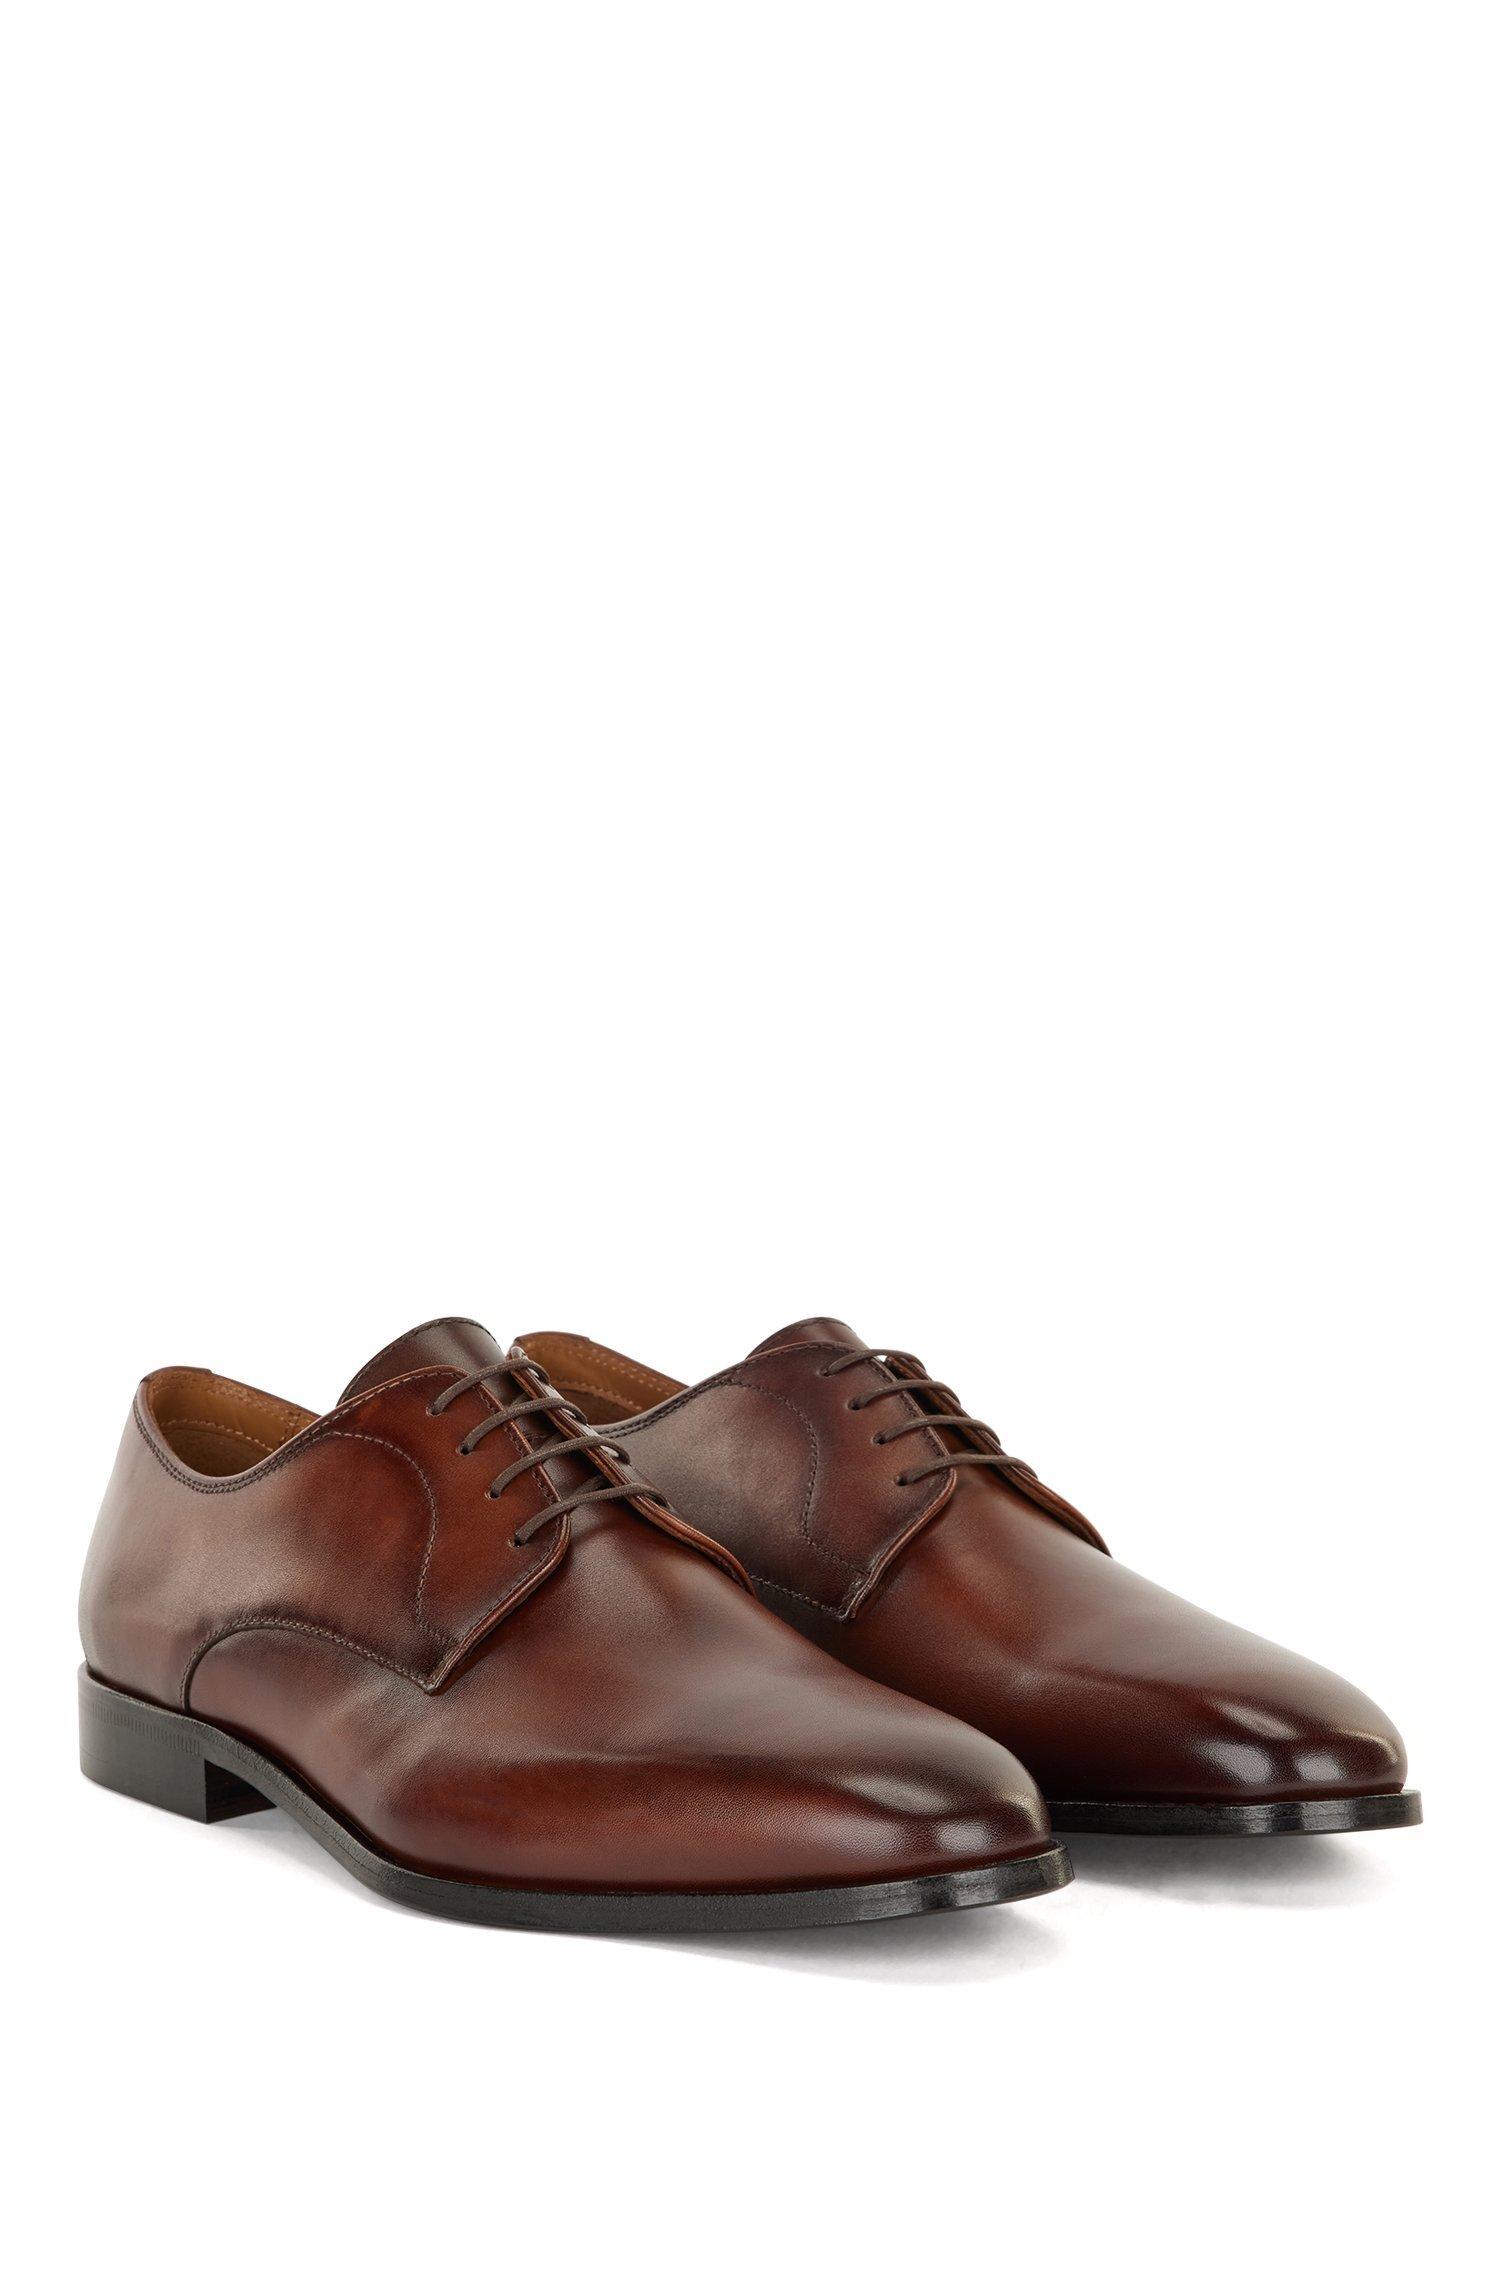 Hugo Boss Derby sko, brun, 44.5